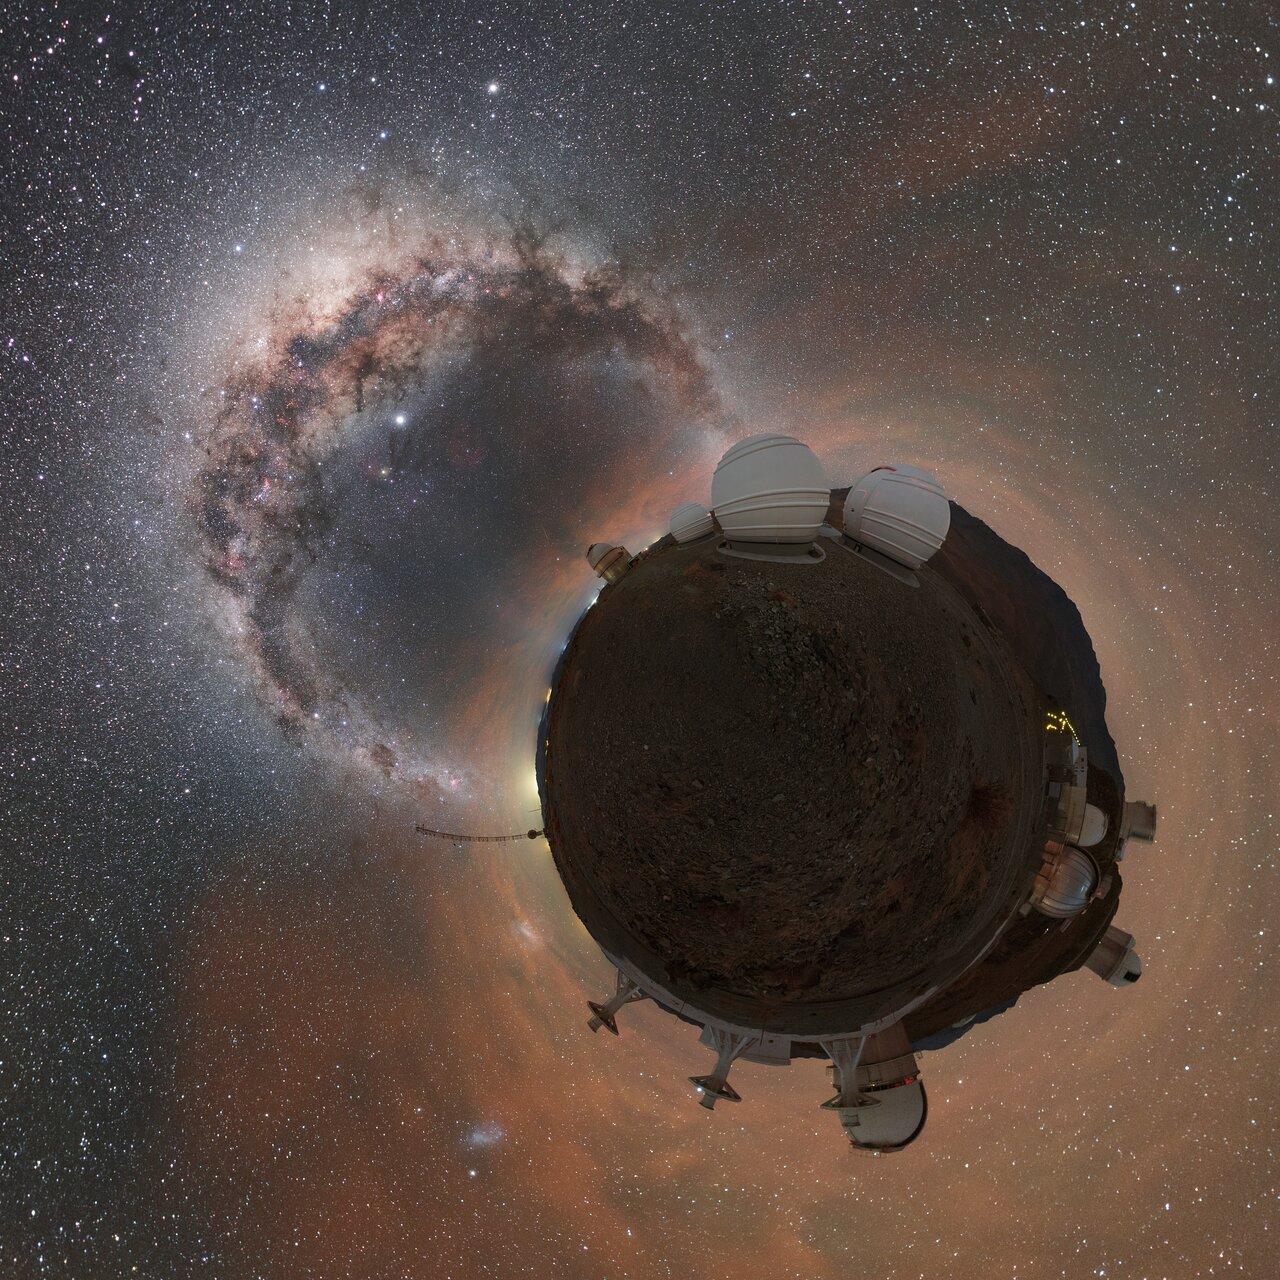 Planet La Silla and the Milky Way